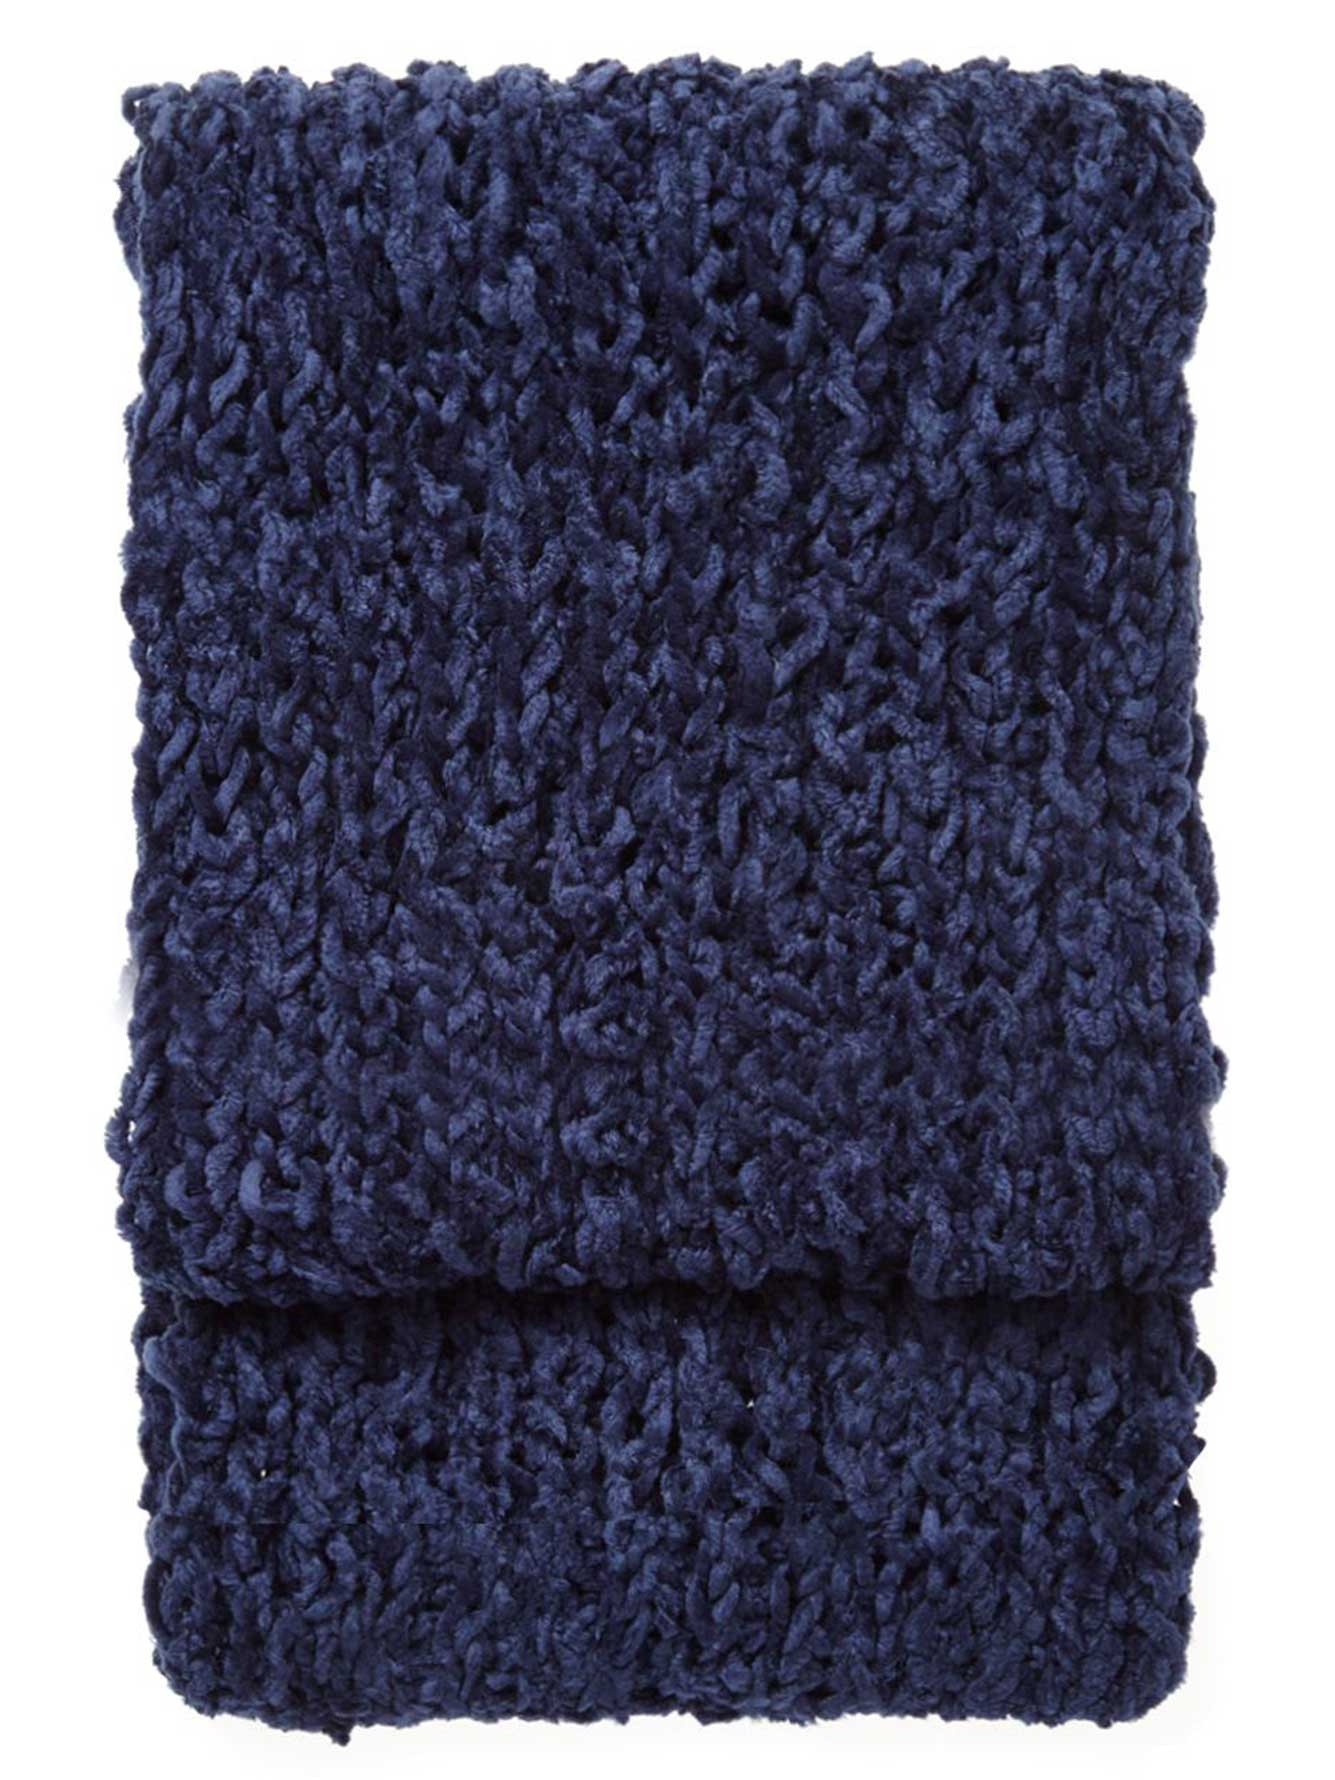 Chenille Knit Infinity Scarf Penningtons